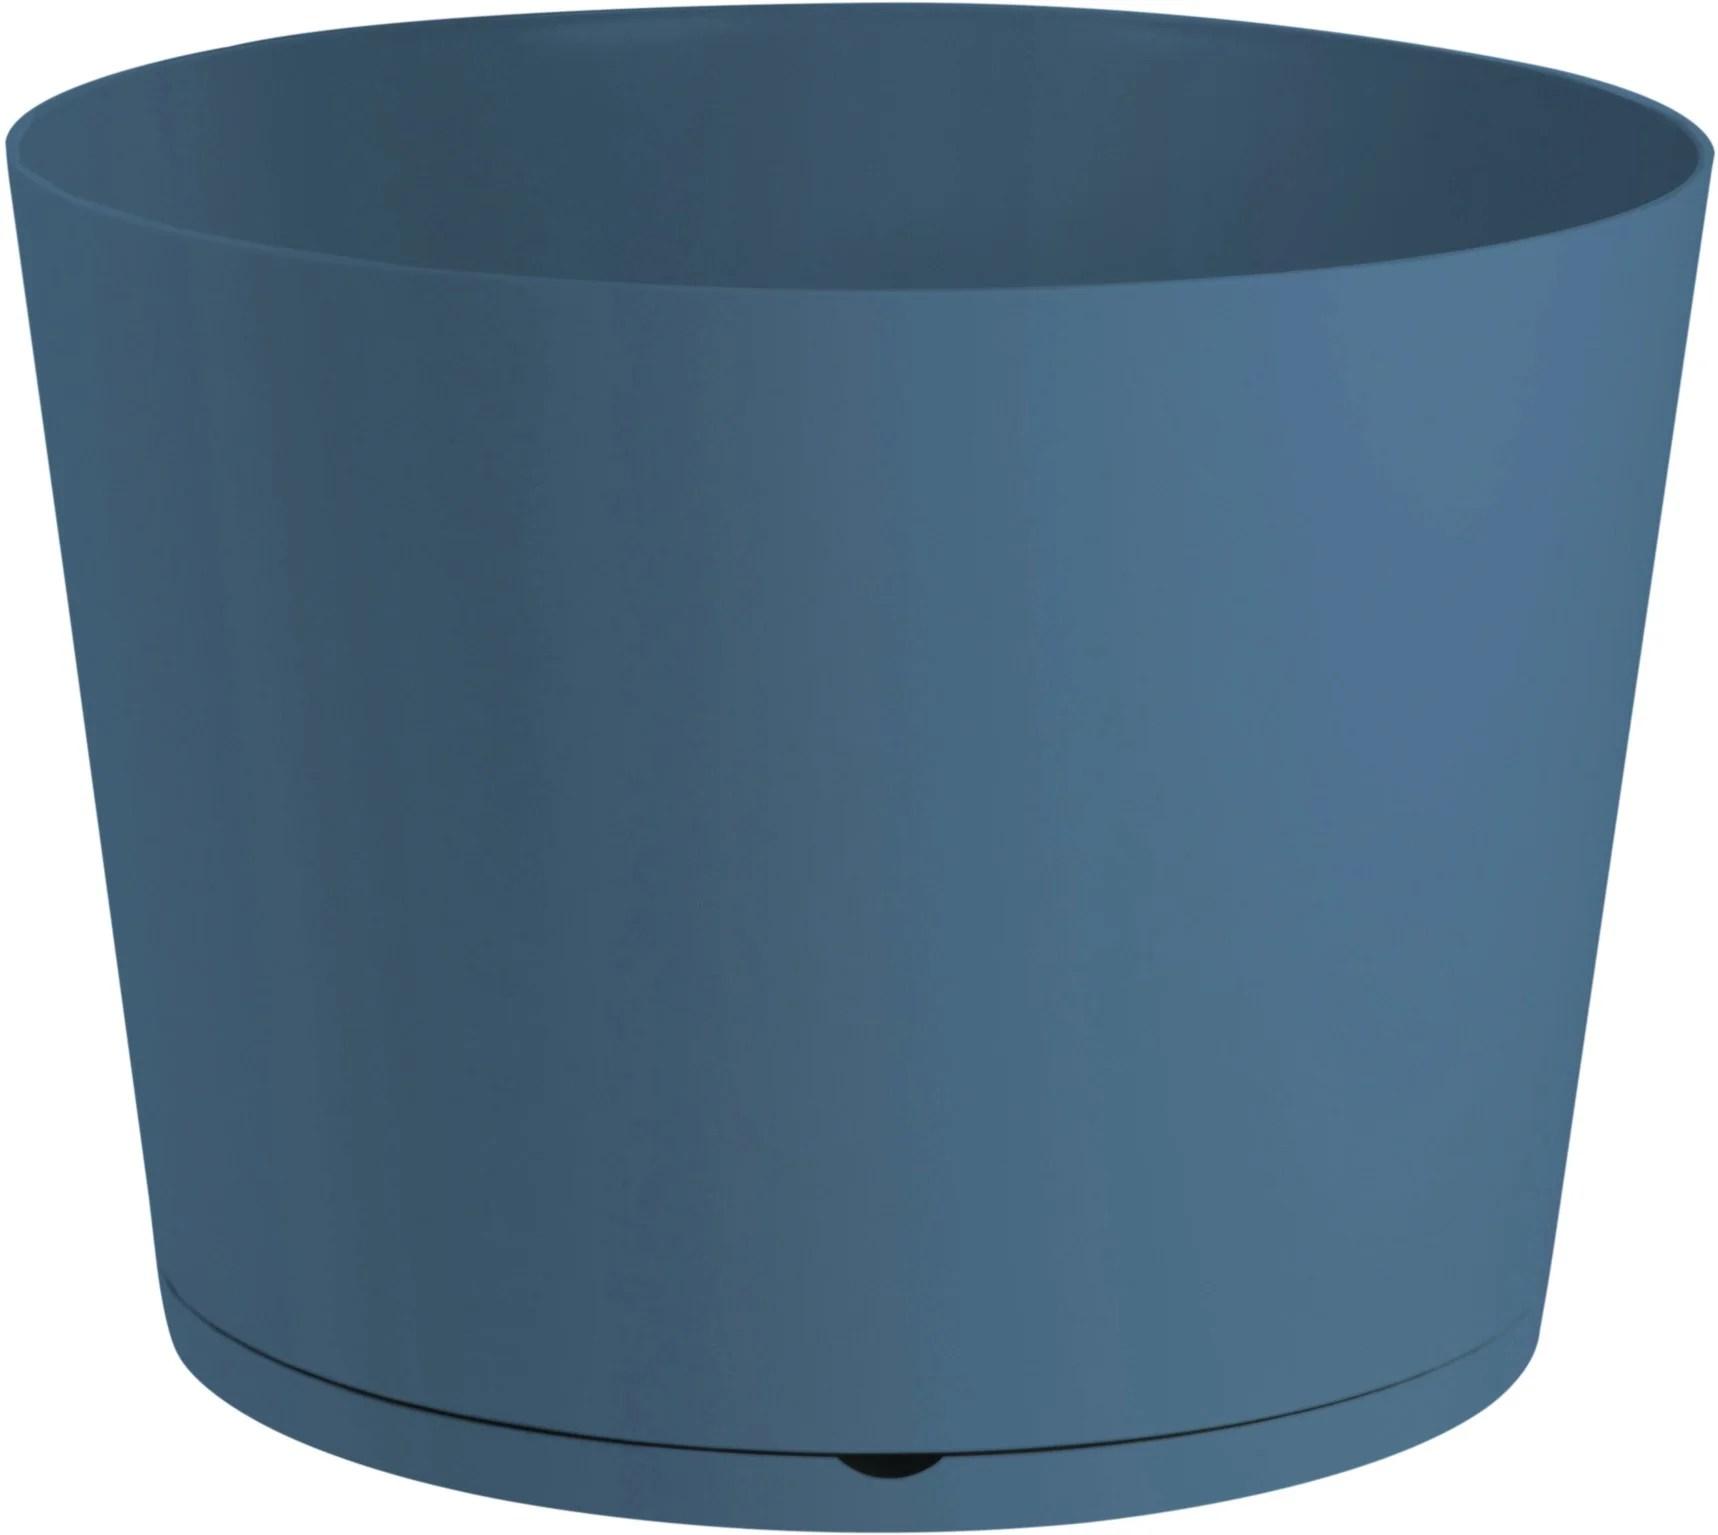 Bac Plastique Pot 2 En 1 Grosfillex Diam 36 L 36 X L 36 X H 25 7 Cm Bleu Denim Leroy Merlin